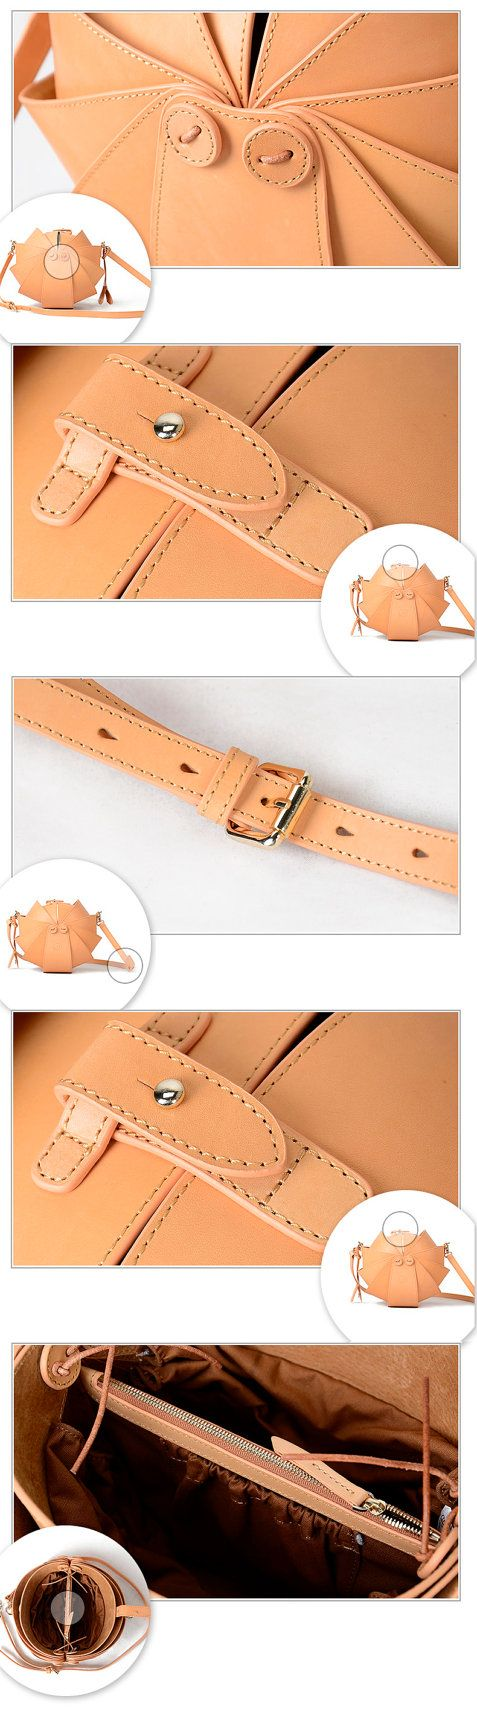 Nude Leather Cross Body Bag-Large Round Shoulder bag by KiliDesign